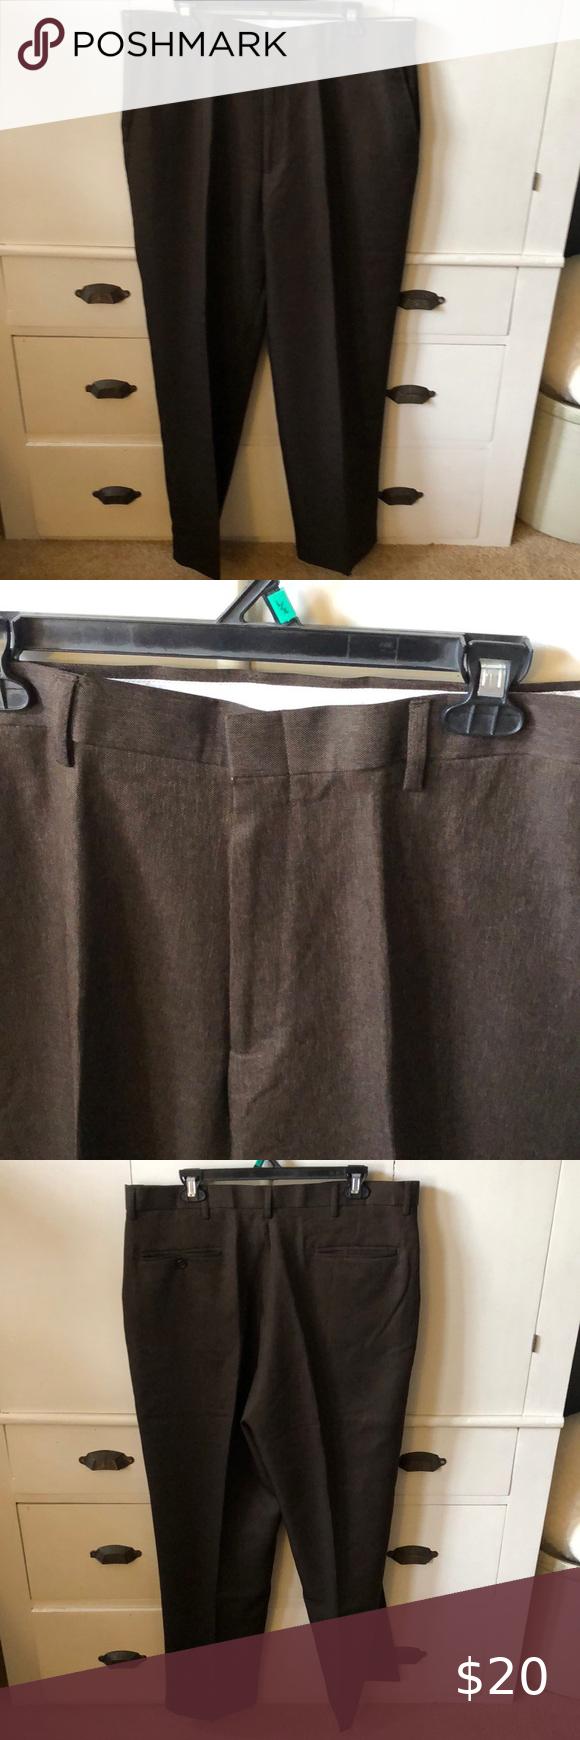 Men S Dress Pants Dress Pants Pants Black Dress Slacks [ 1740 x 580 Pixel ]